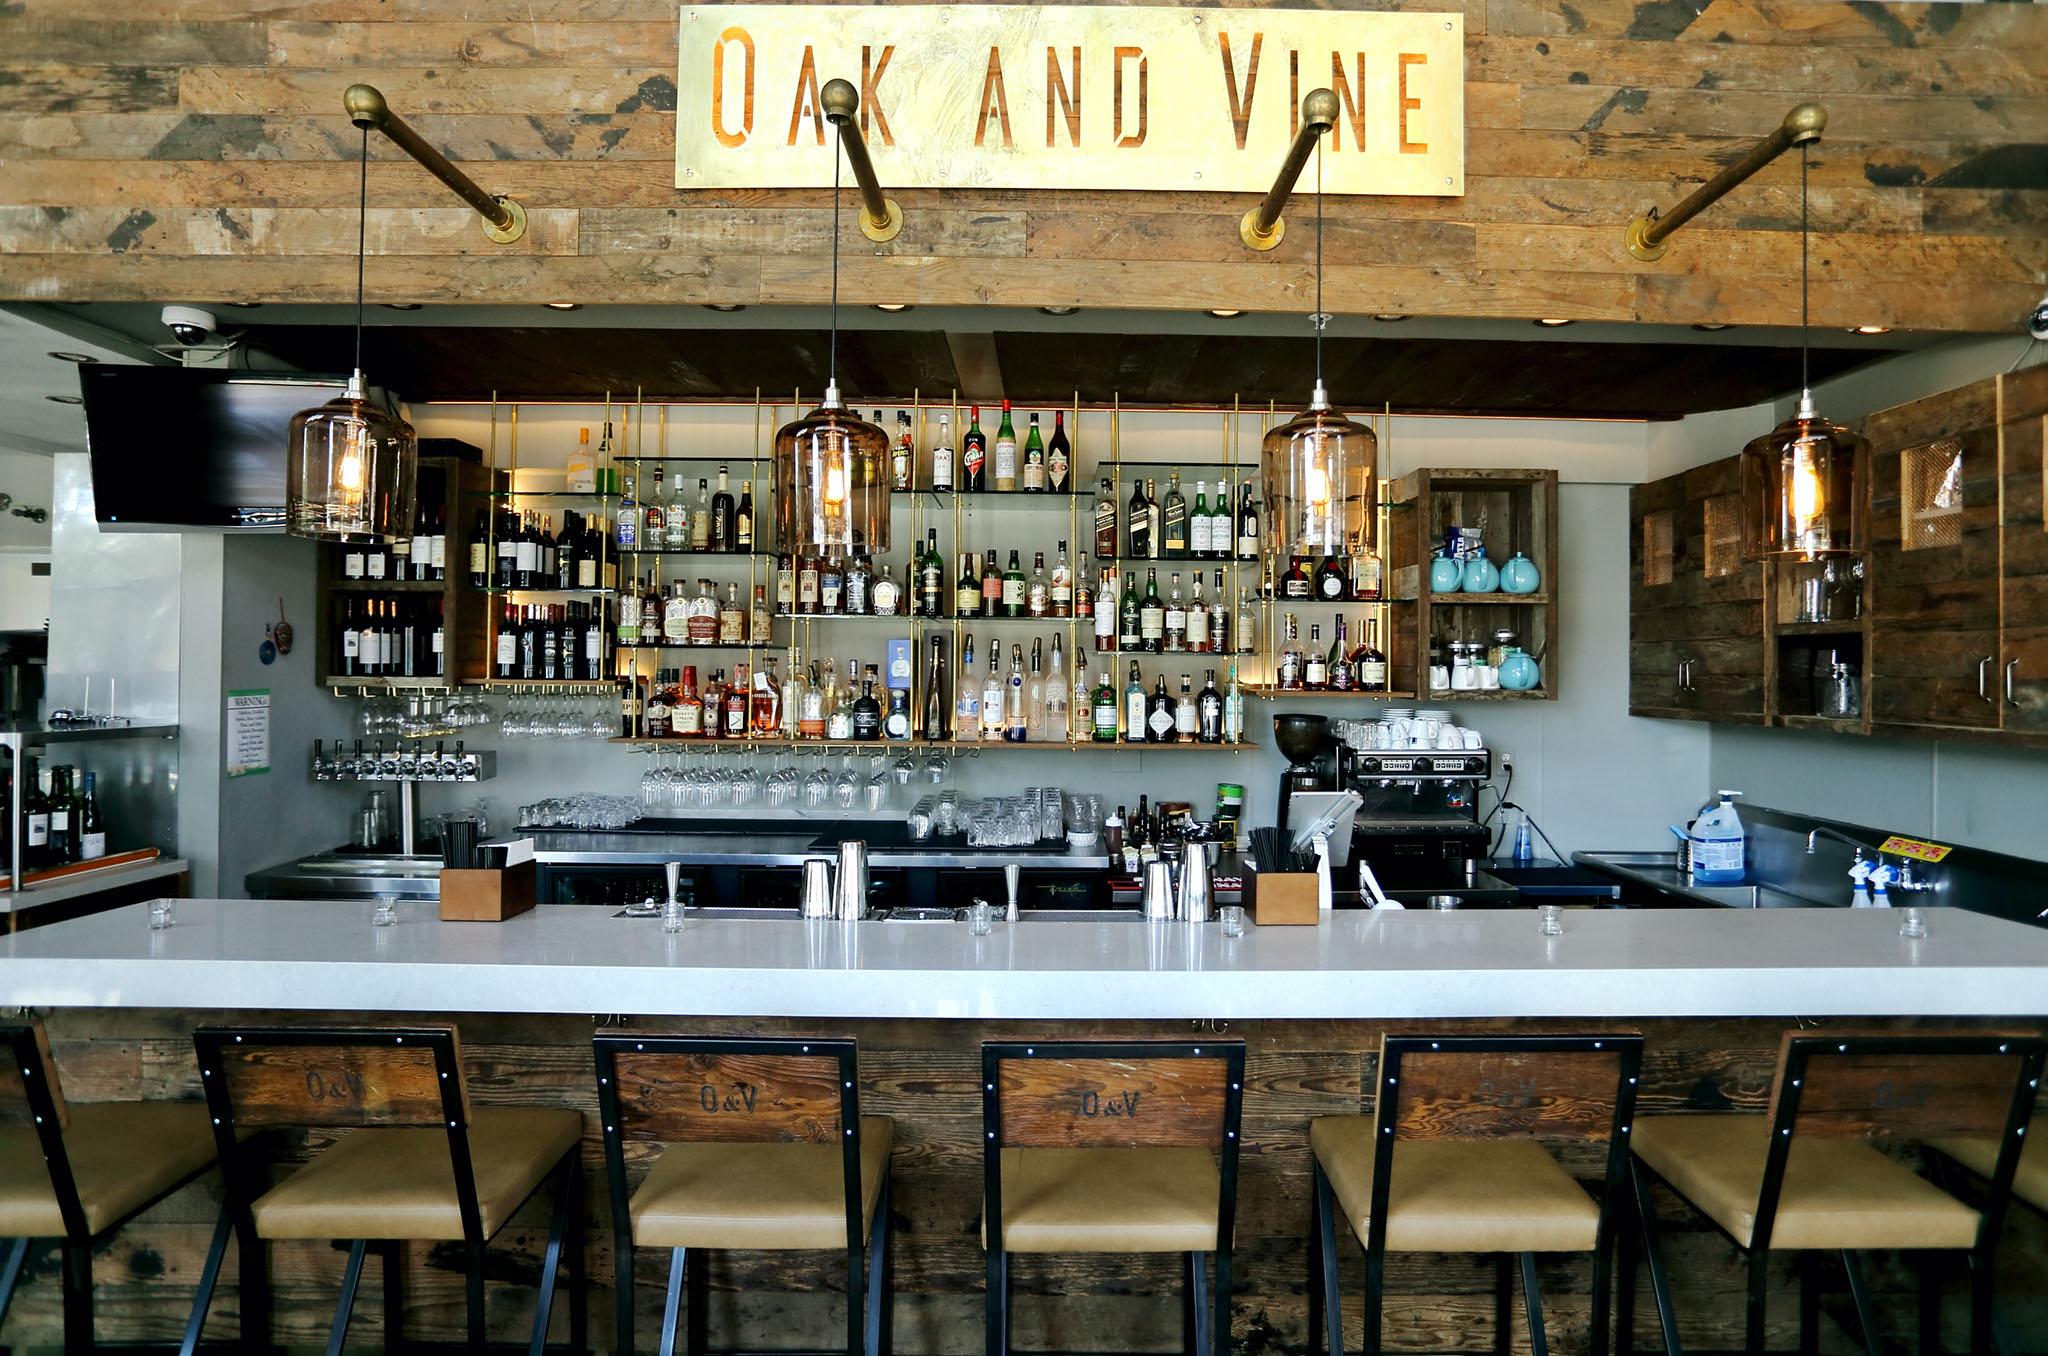 The Oak and Vine